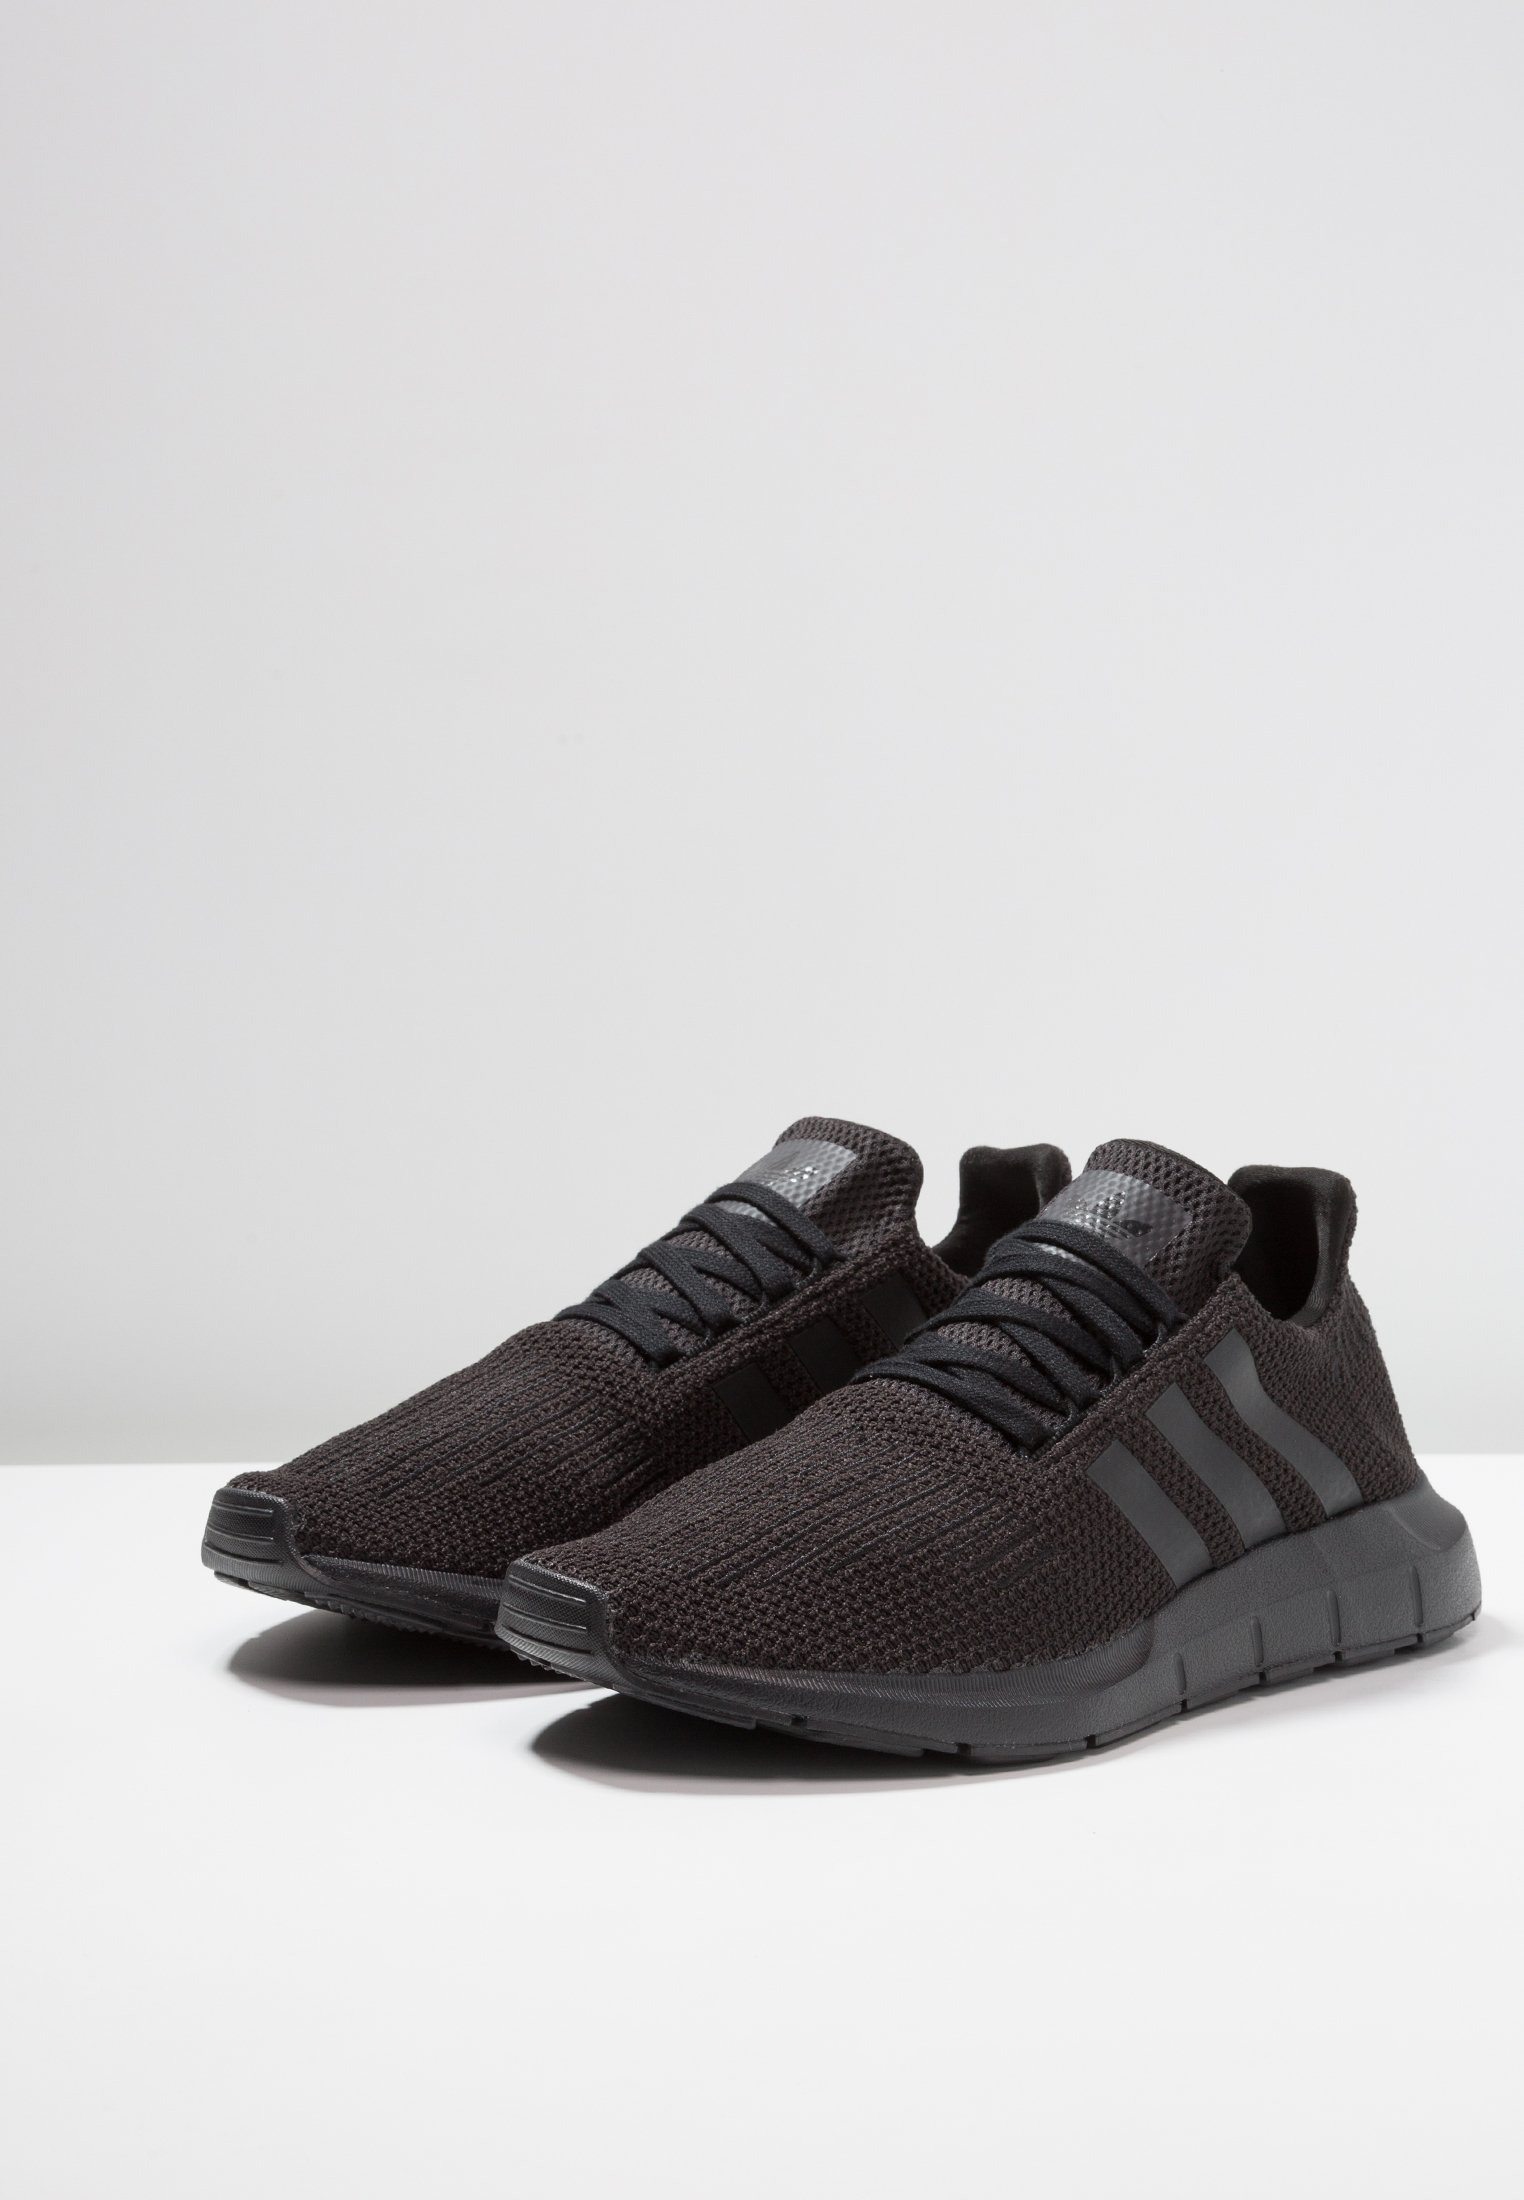 Originals footwear White Adidas RunBaskets Core Black Basses Swift 0PN8Ovwynm